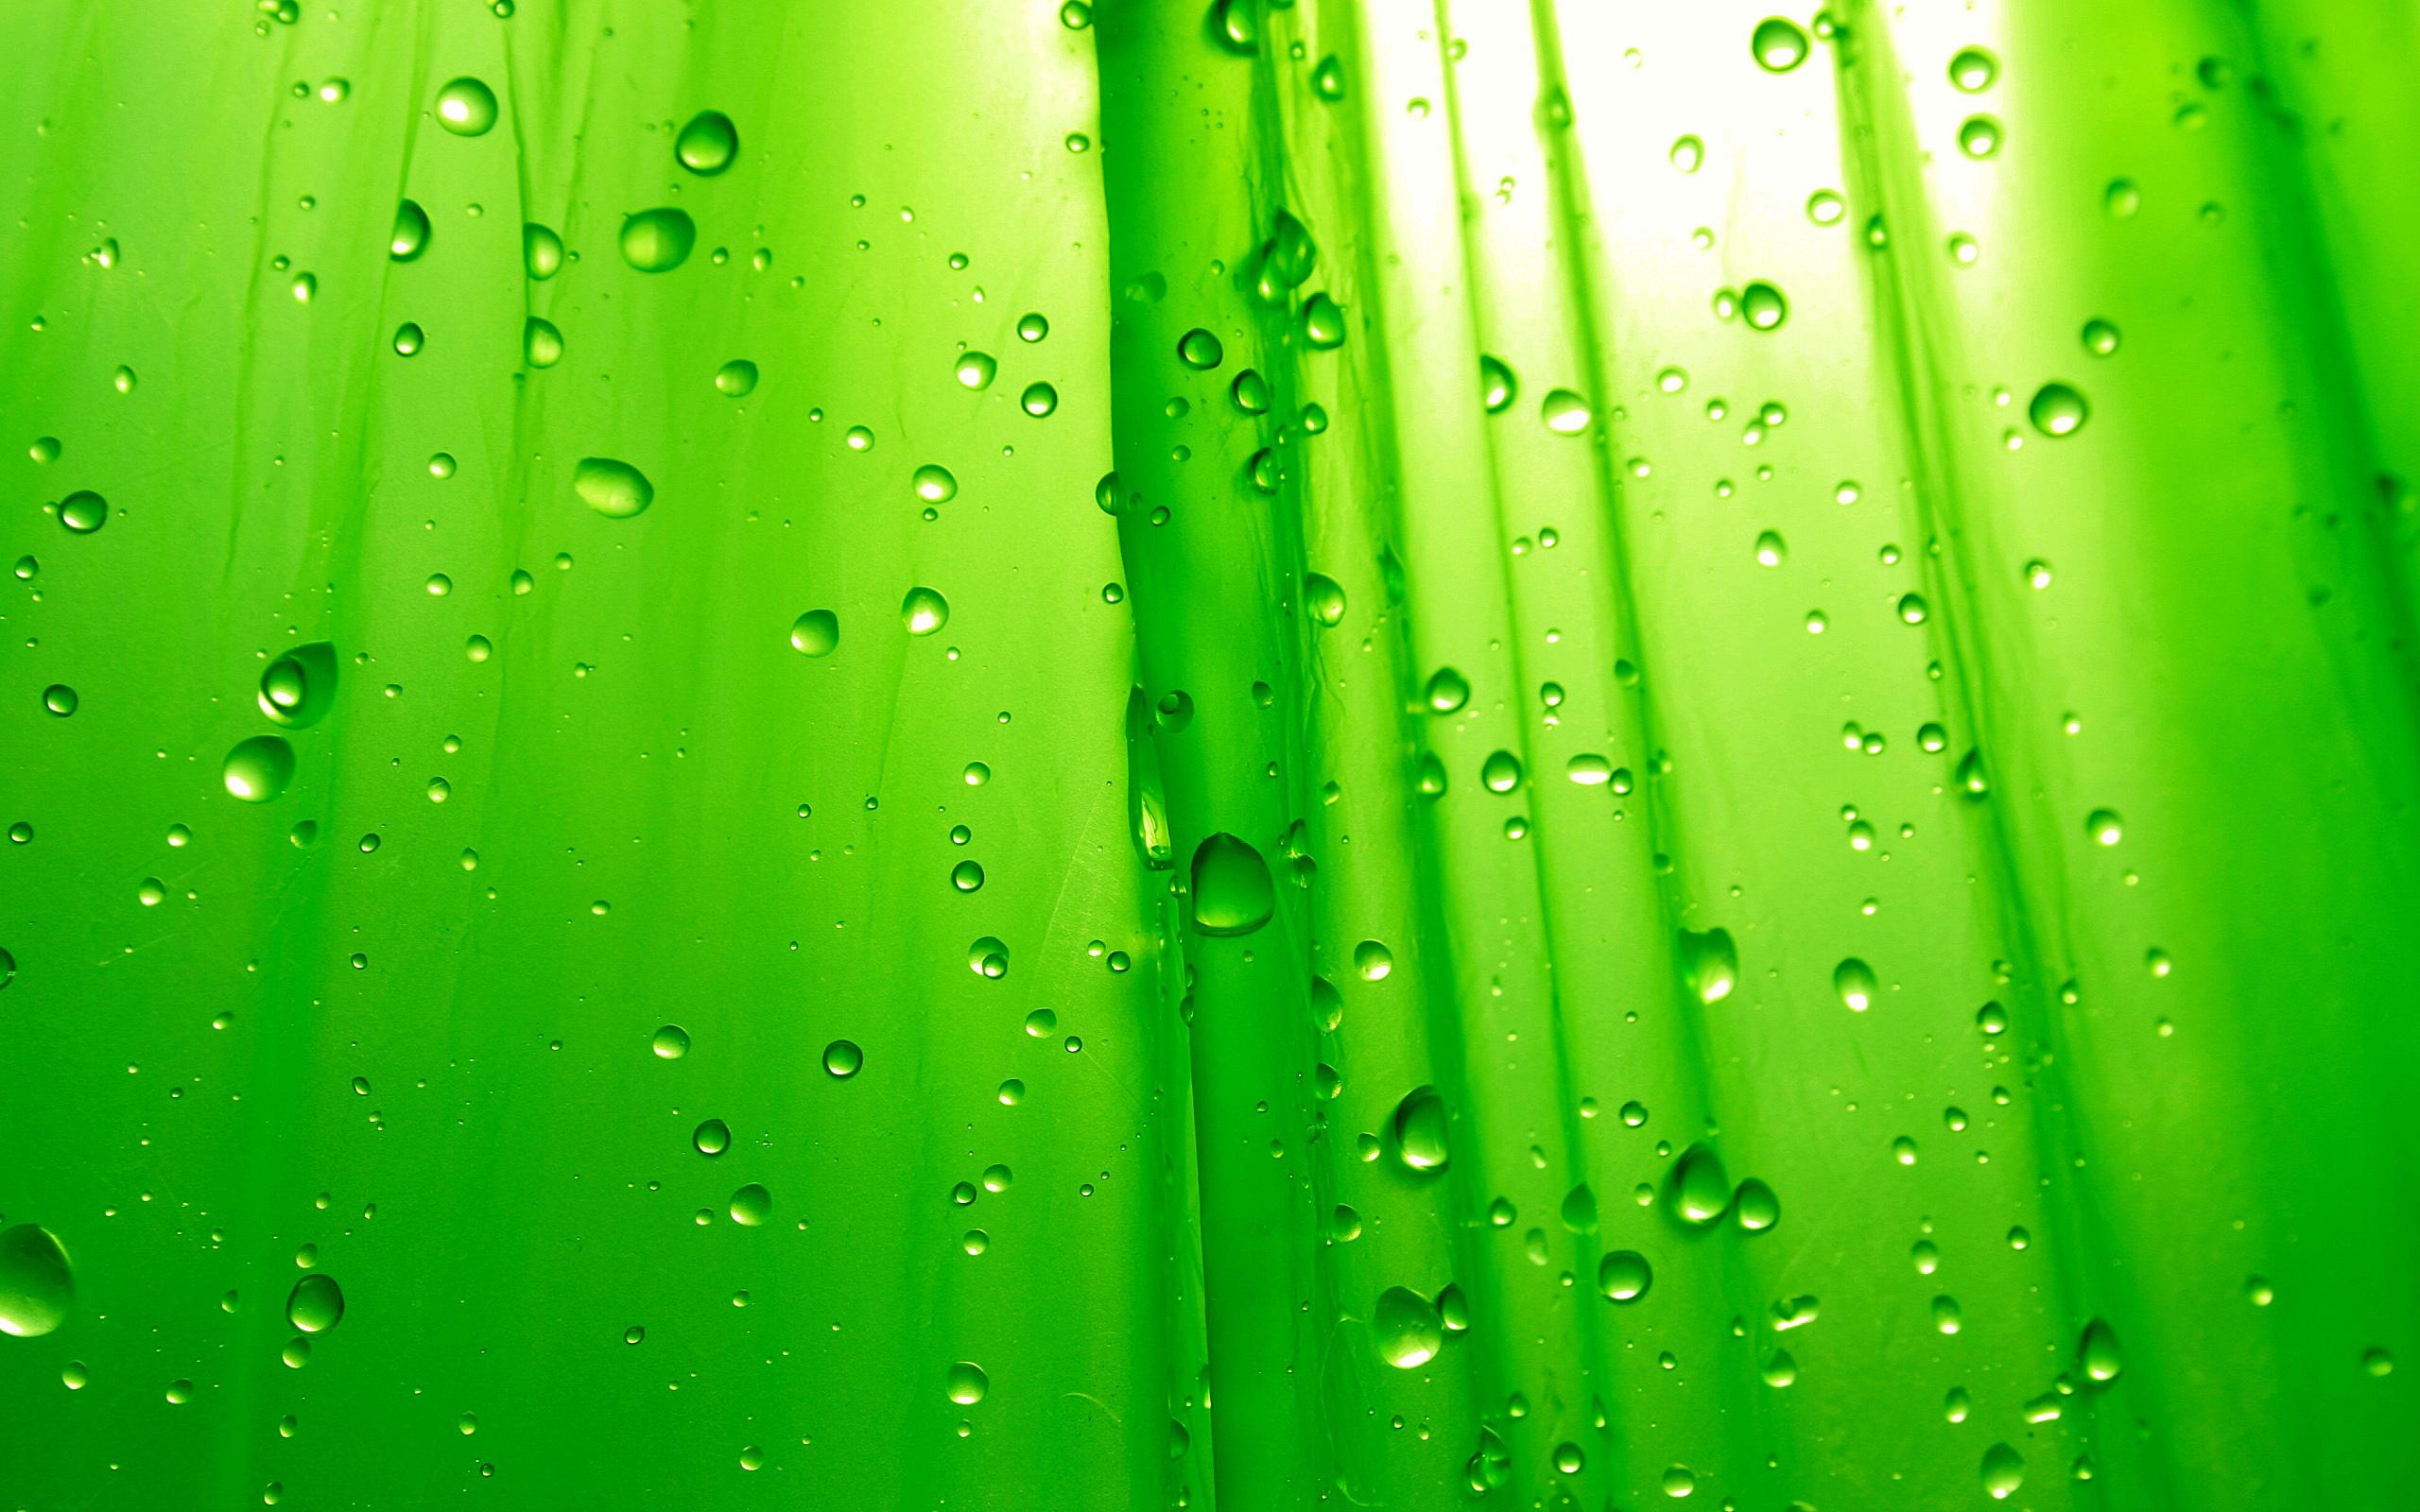 Neon wallpaper   simply green wallpaperjpg Wallpapers   HD Wallpapers 2560x1600